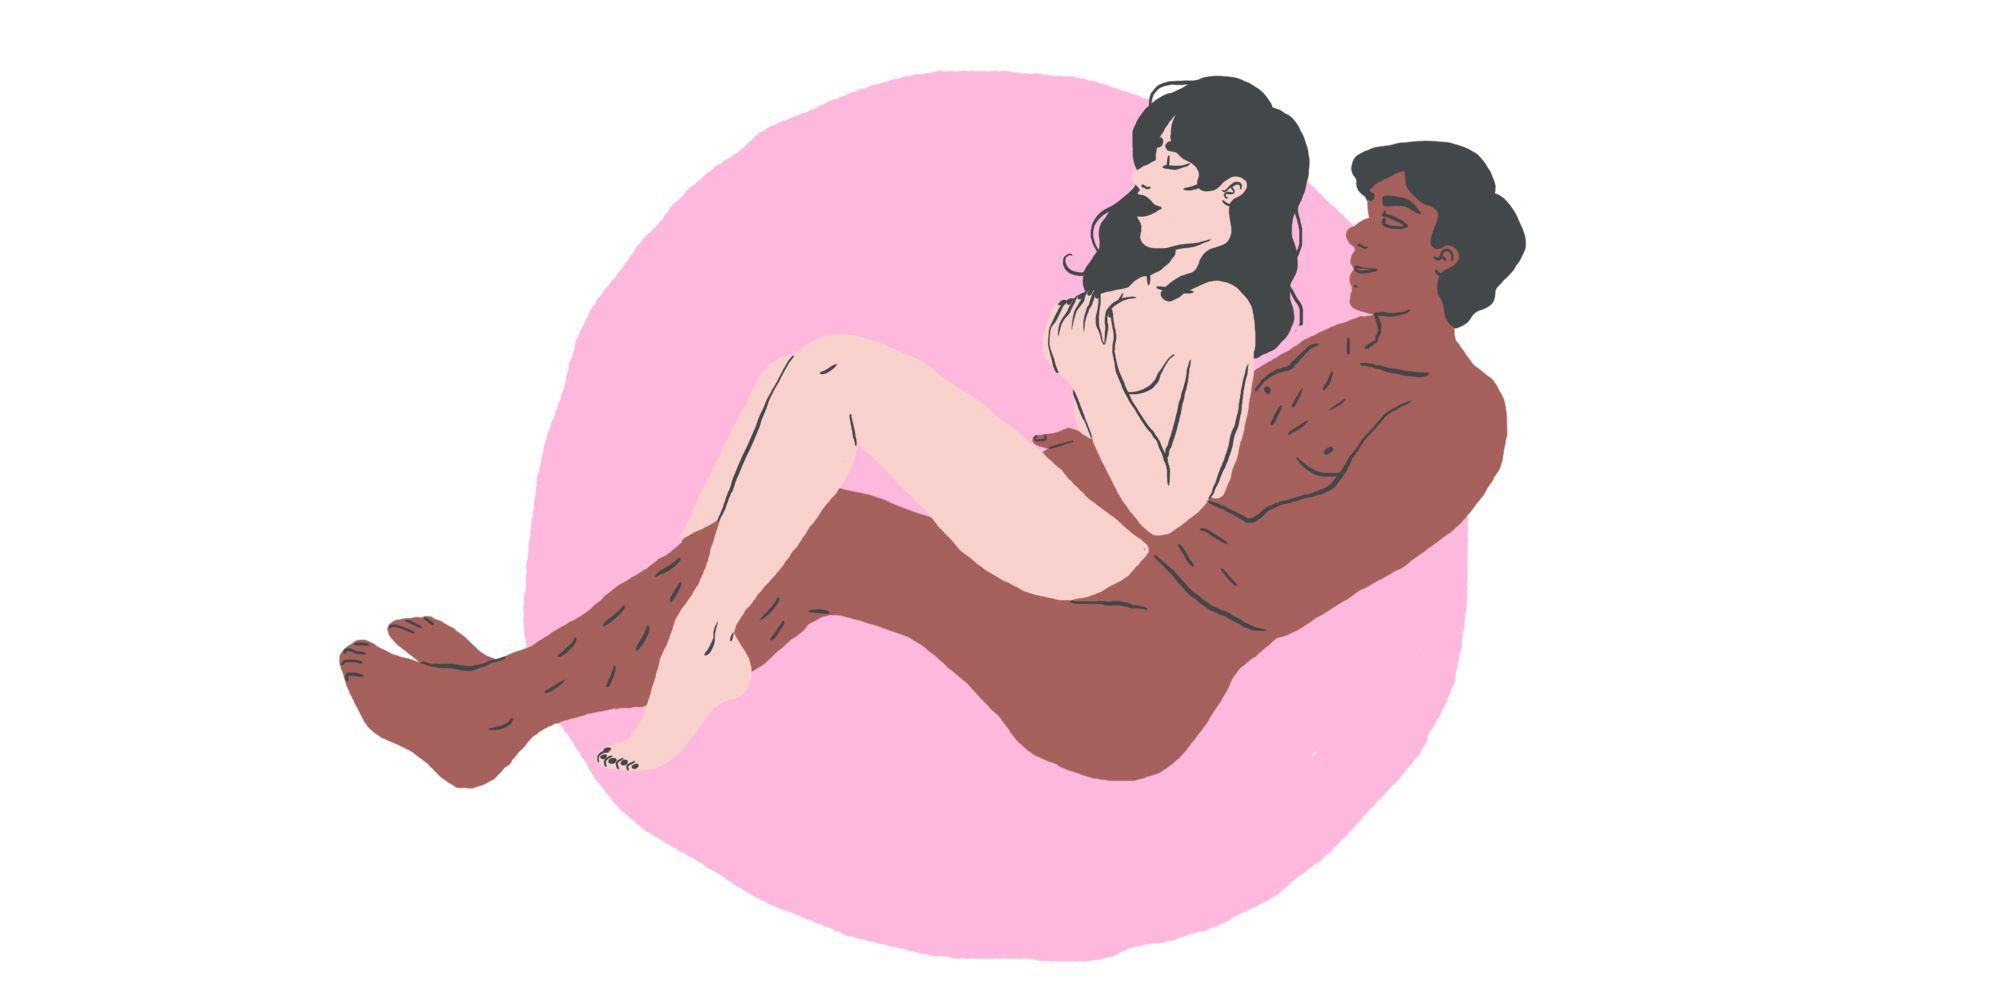 Sex positions sucking cock advise